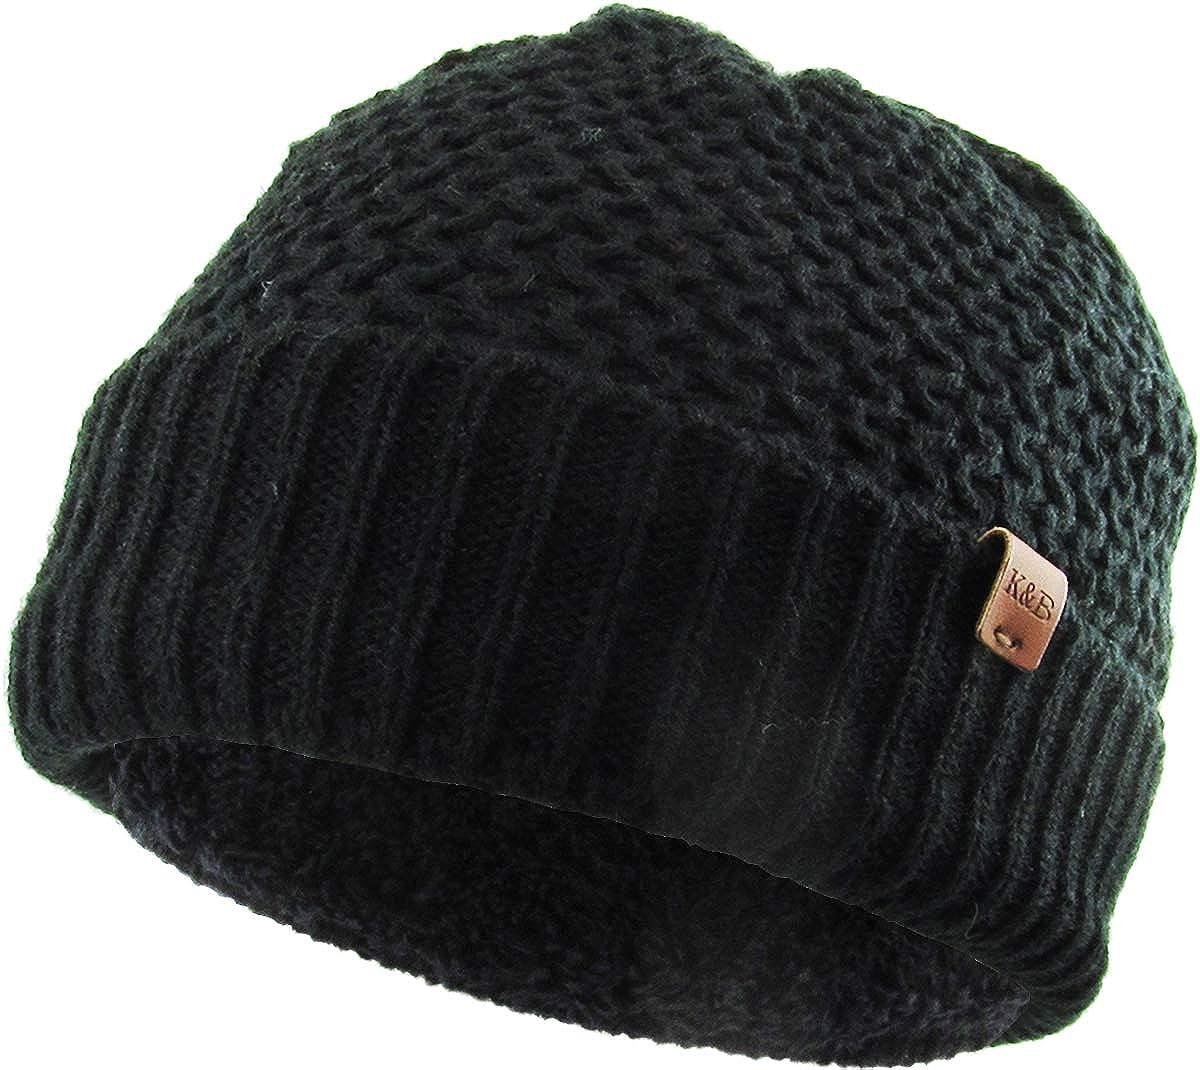 Free Crochet Skull Hat Pattern Best Inspiration Ideas